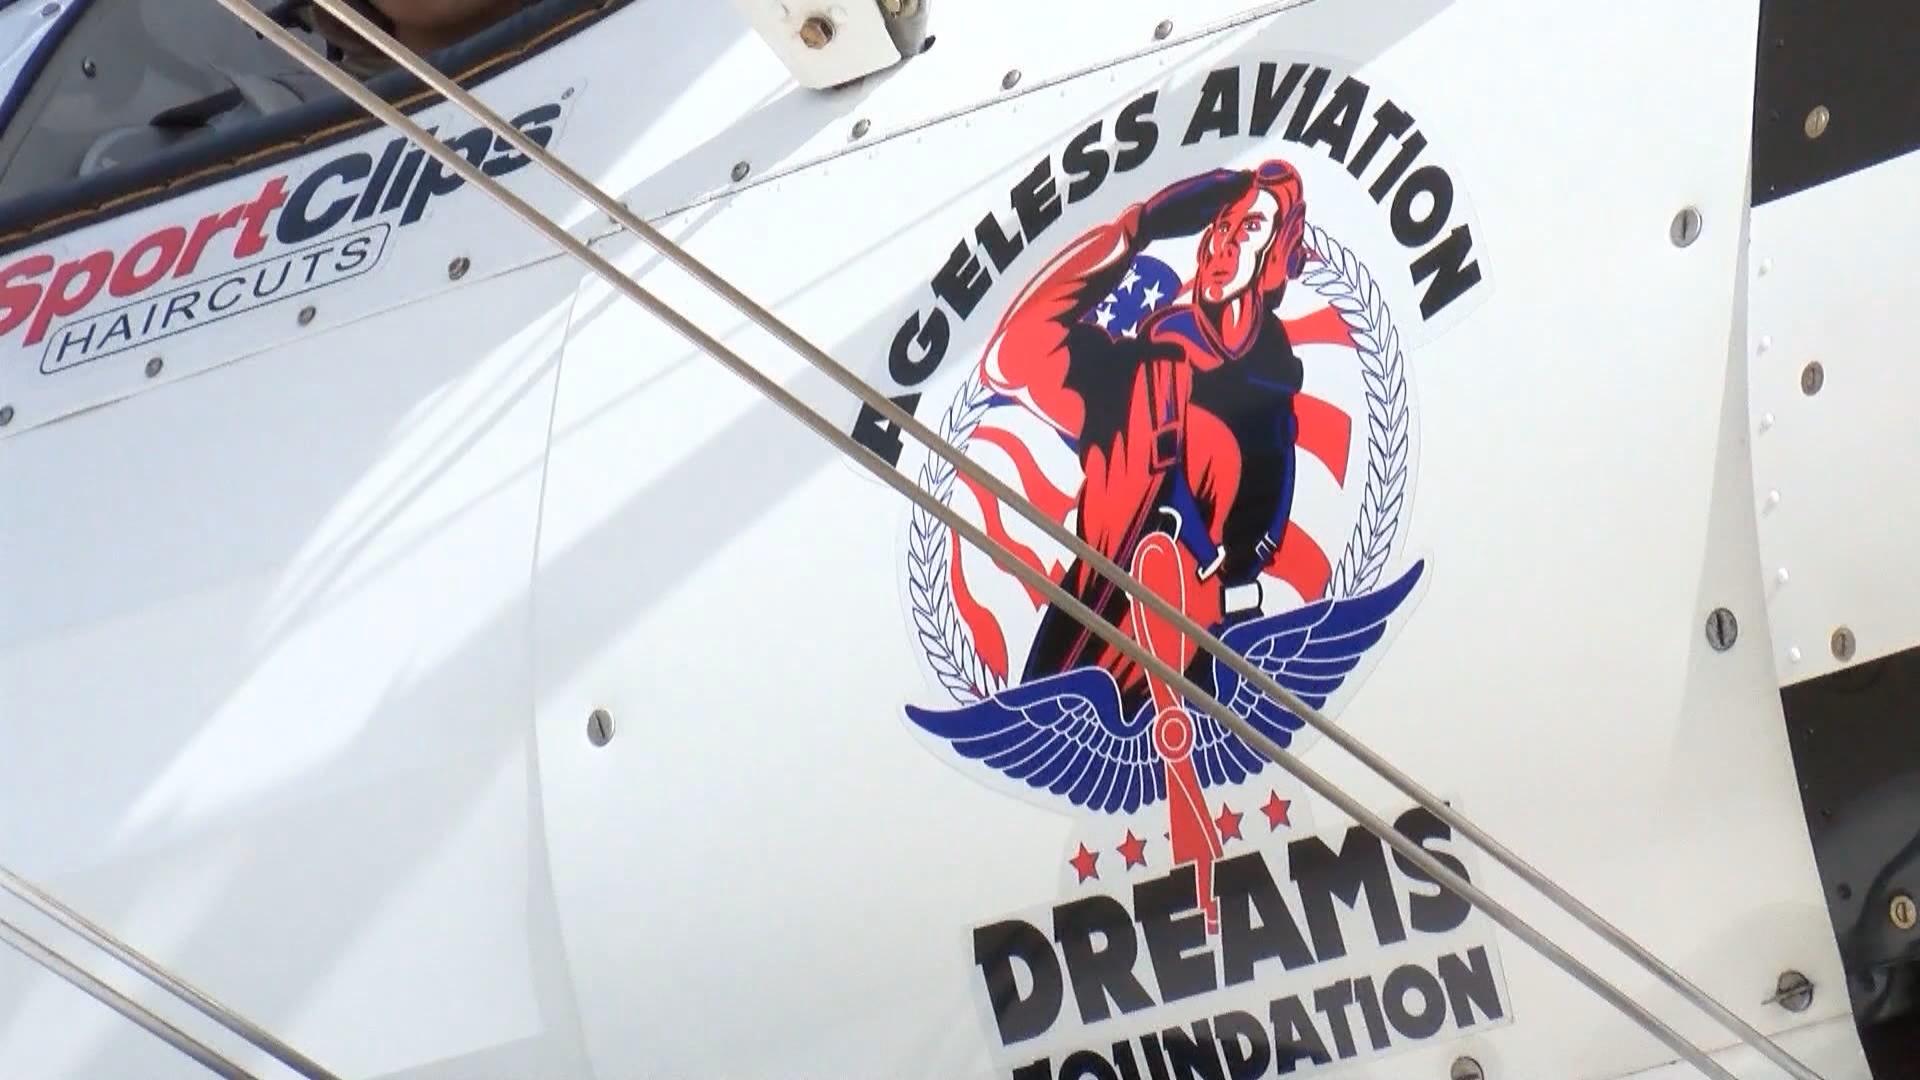 ageless aviation dreams foundation_1505252962560.jpg